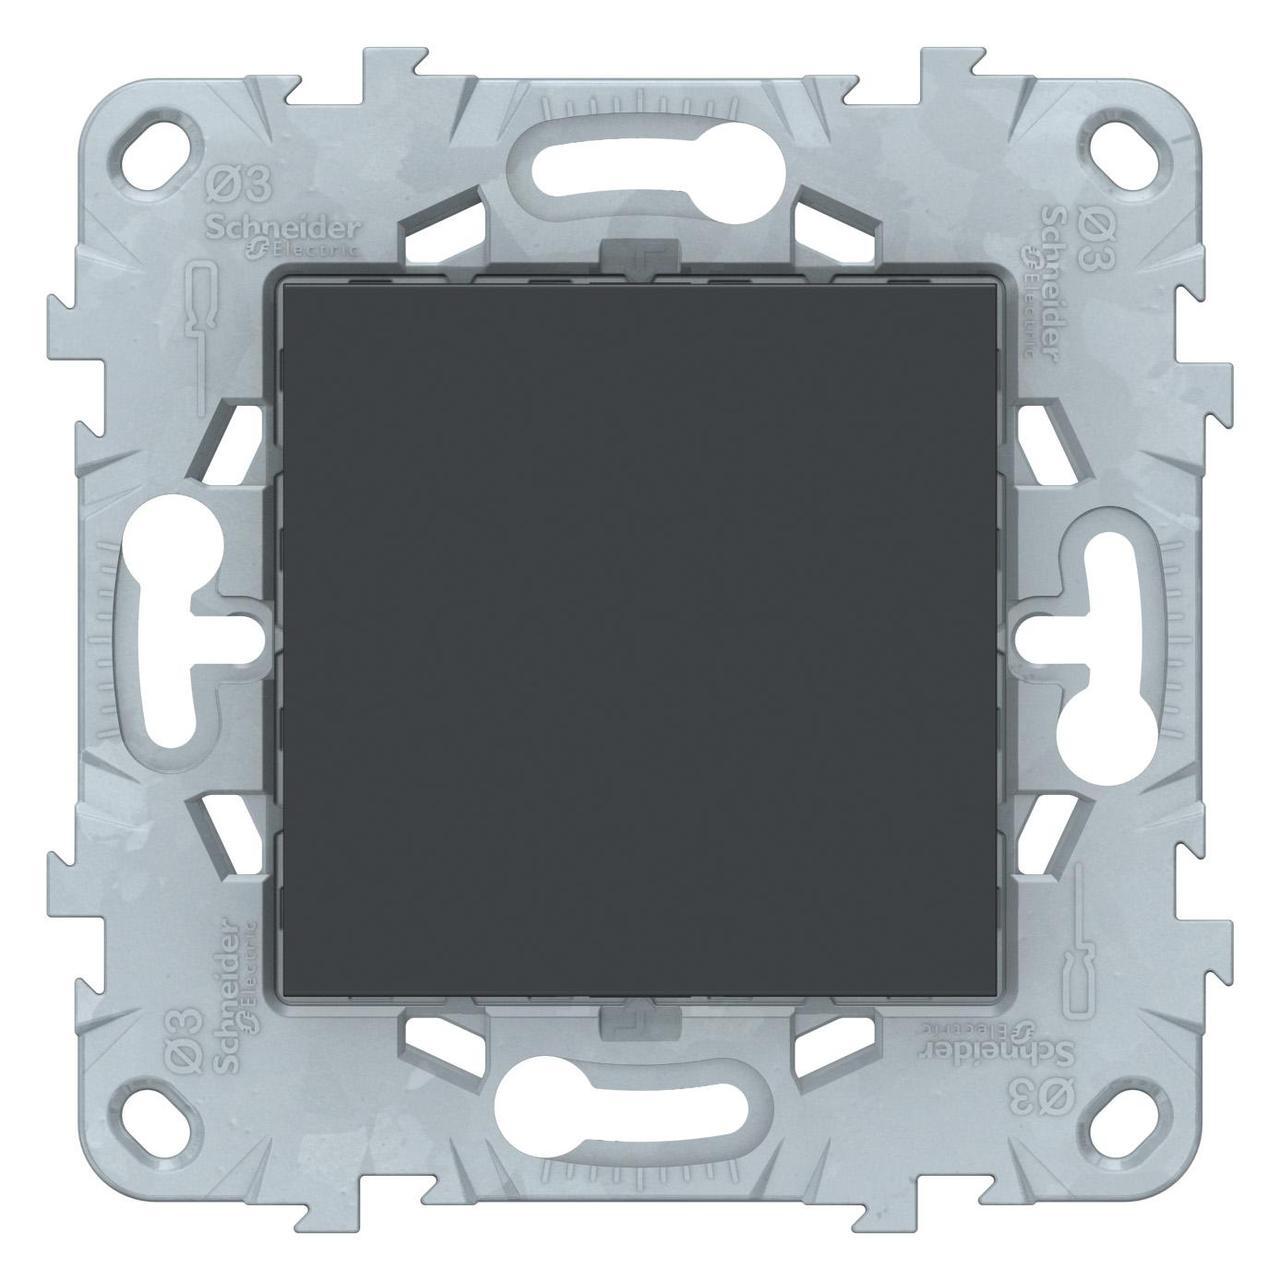 Заглушка , Антрацит, серия Unica New, Schneider Electric